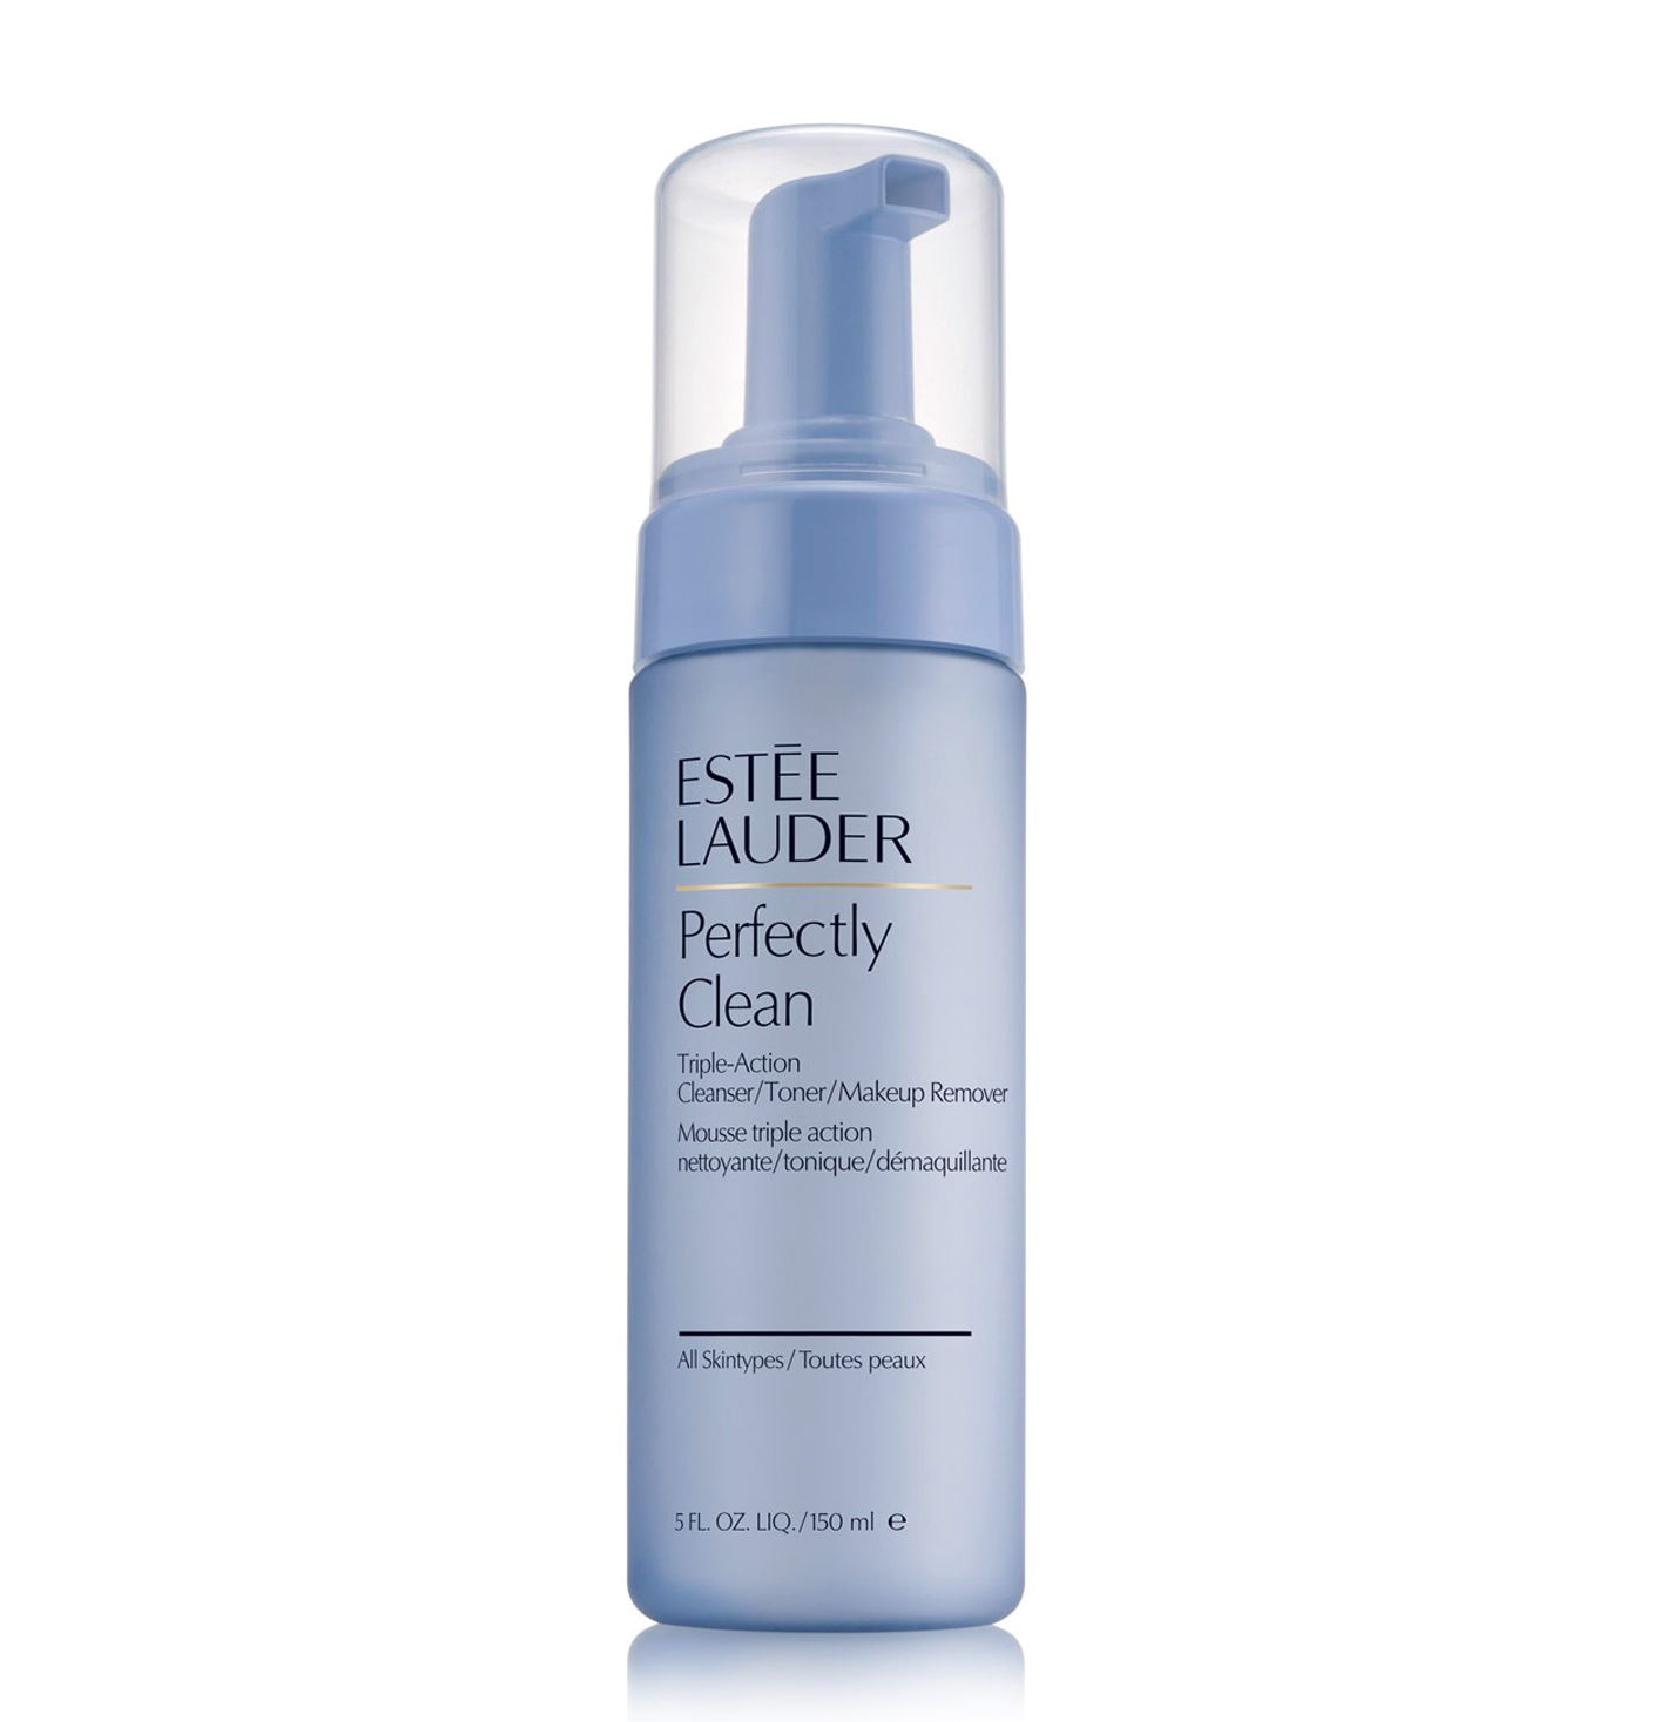 Estée Lauder - Perfectly Clean 3-in-1